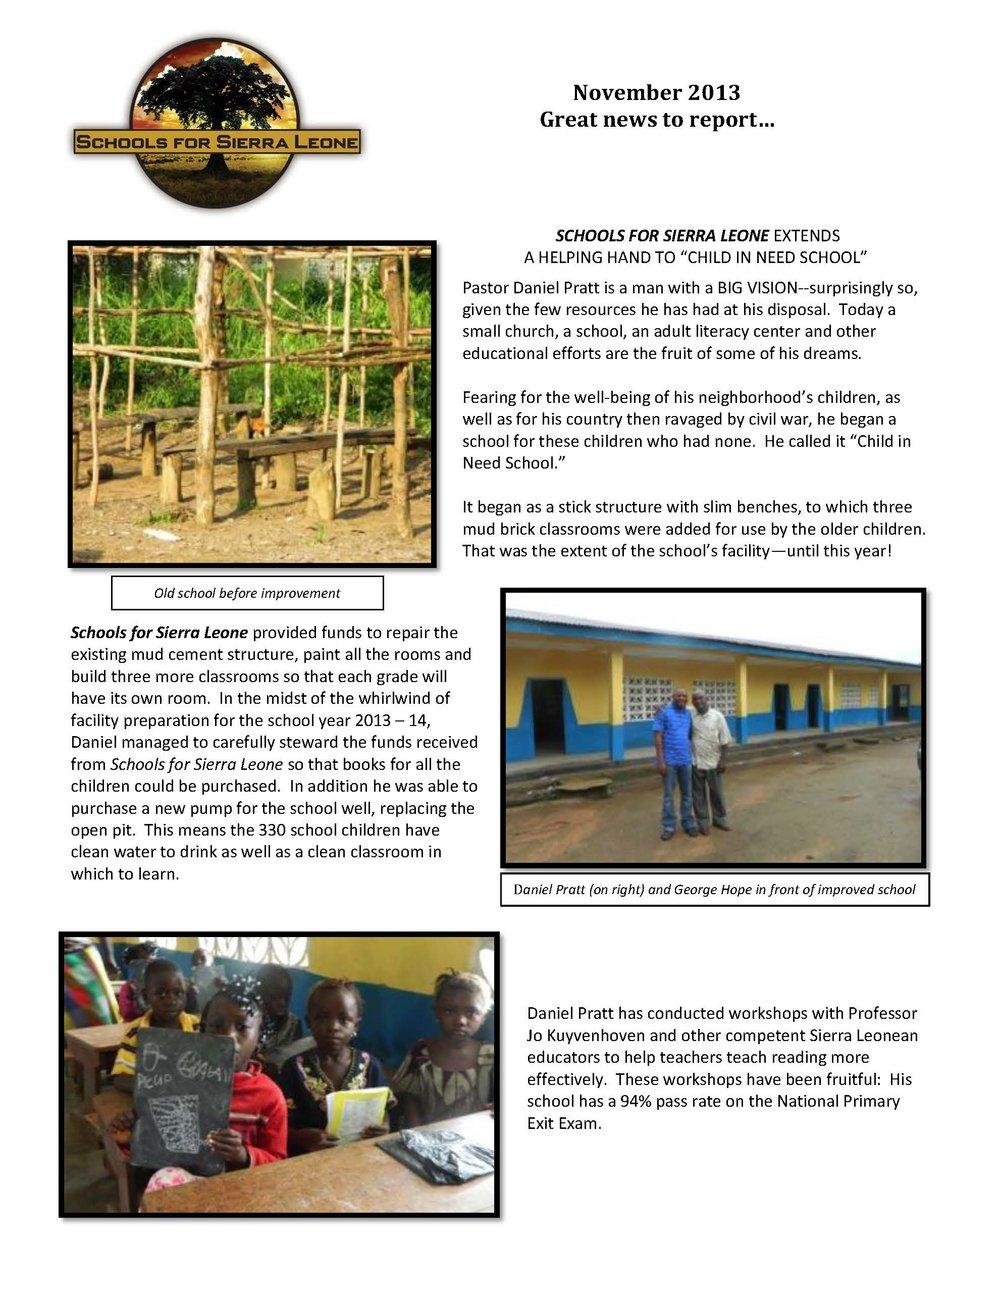 School Updates — Schools for Sierra Leone